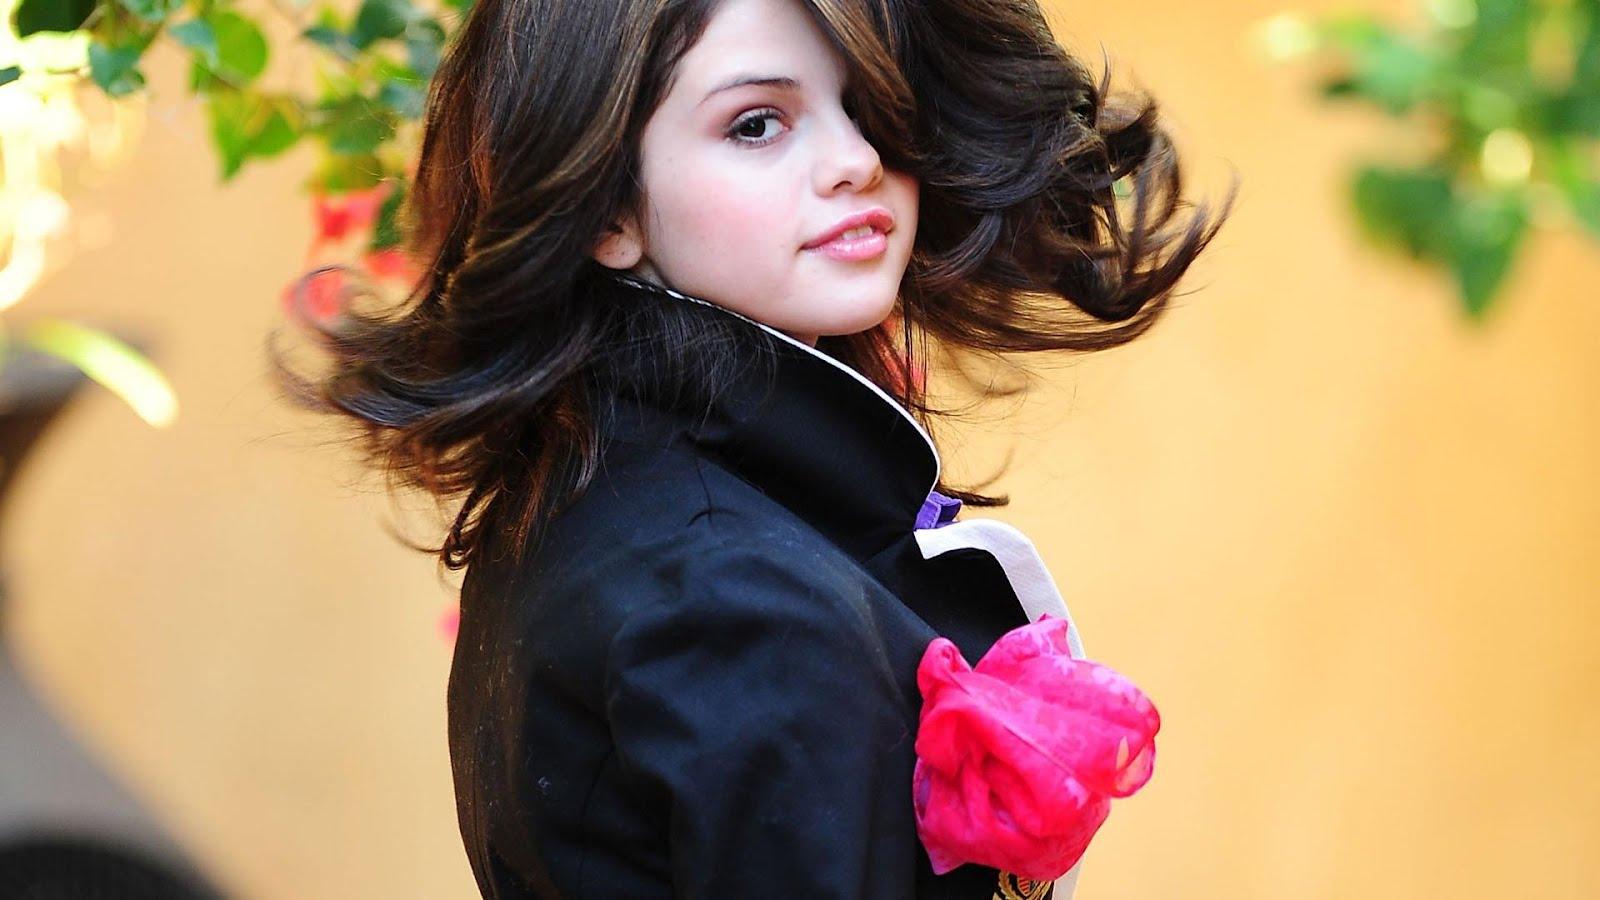 Selena gomez hd wallpapers for Teenage girl wallpapers